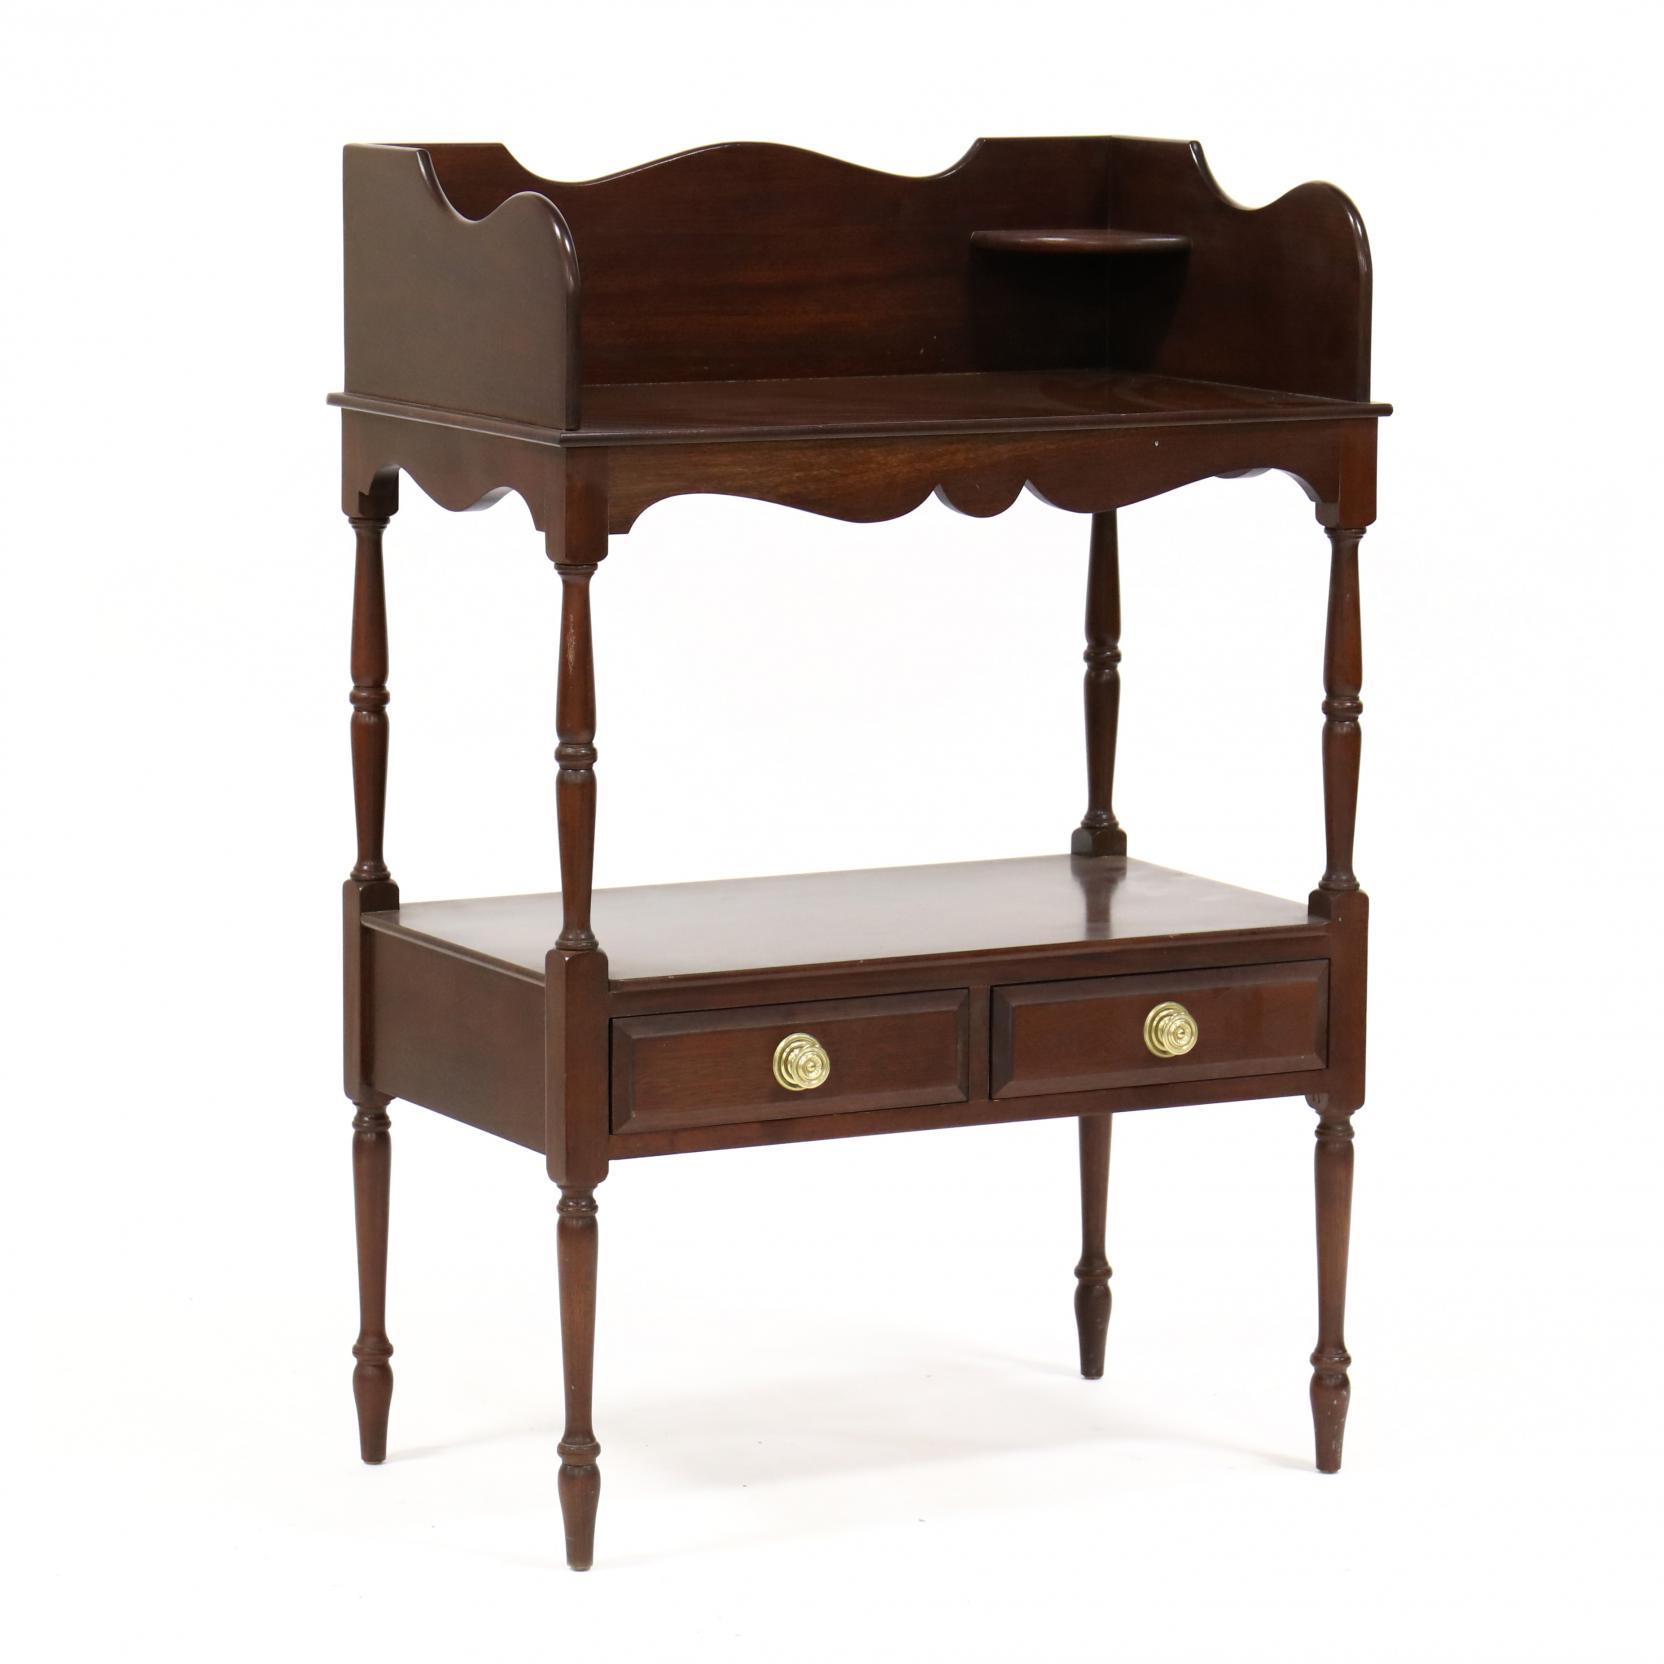 sheraton-style-mahogany-wash-stand